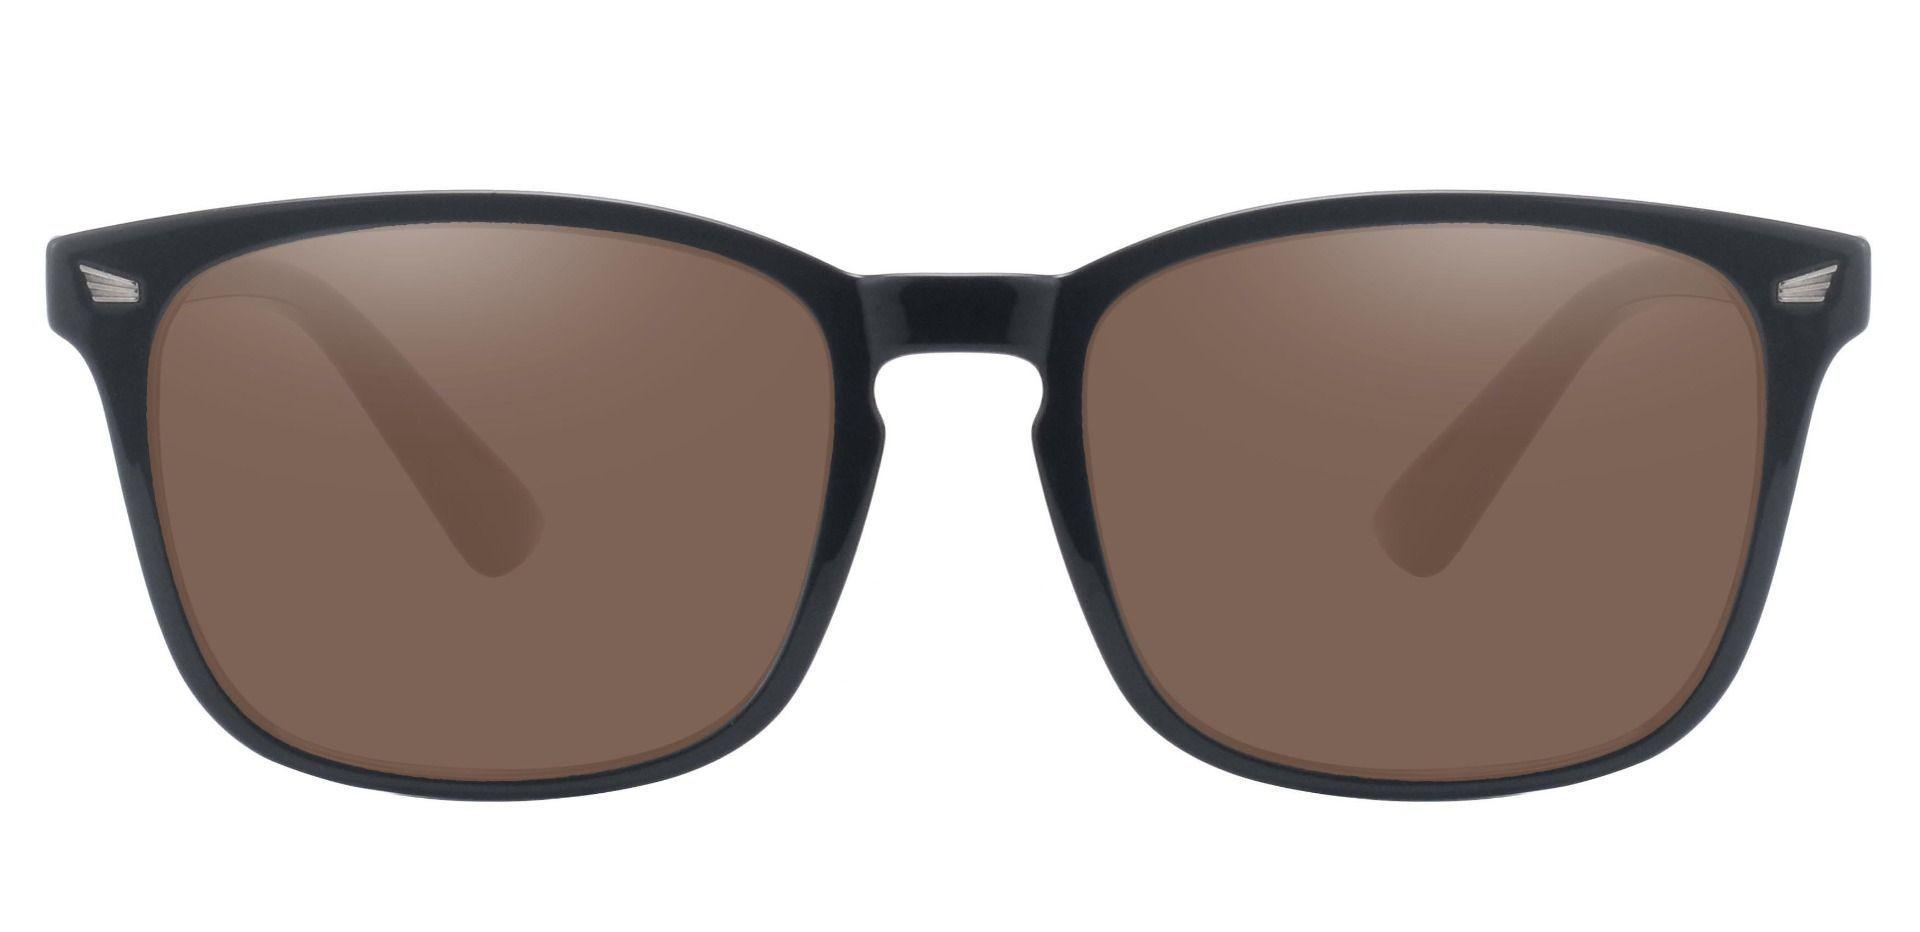 Rogan Square Prescription Sunglasses - Black Frame With Brown Lenses